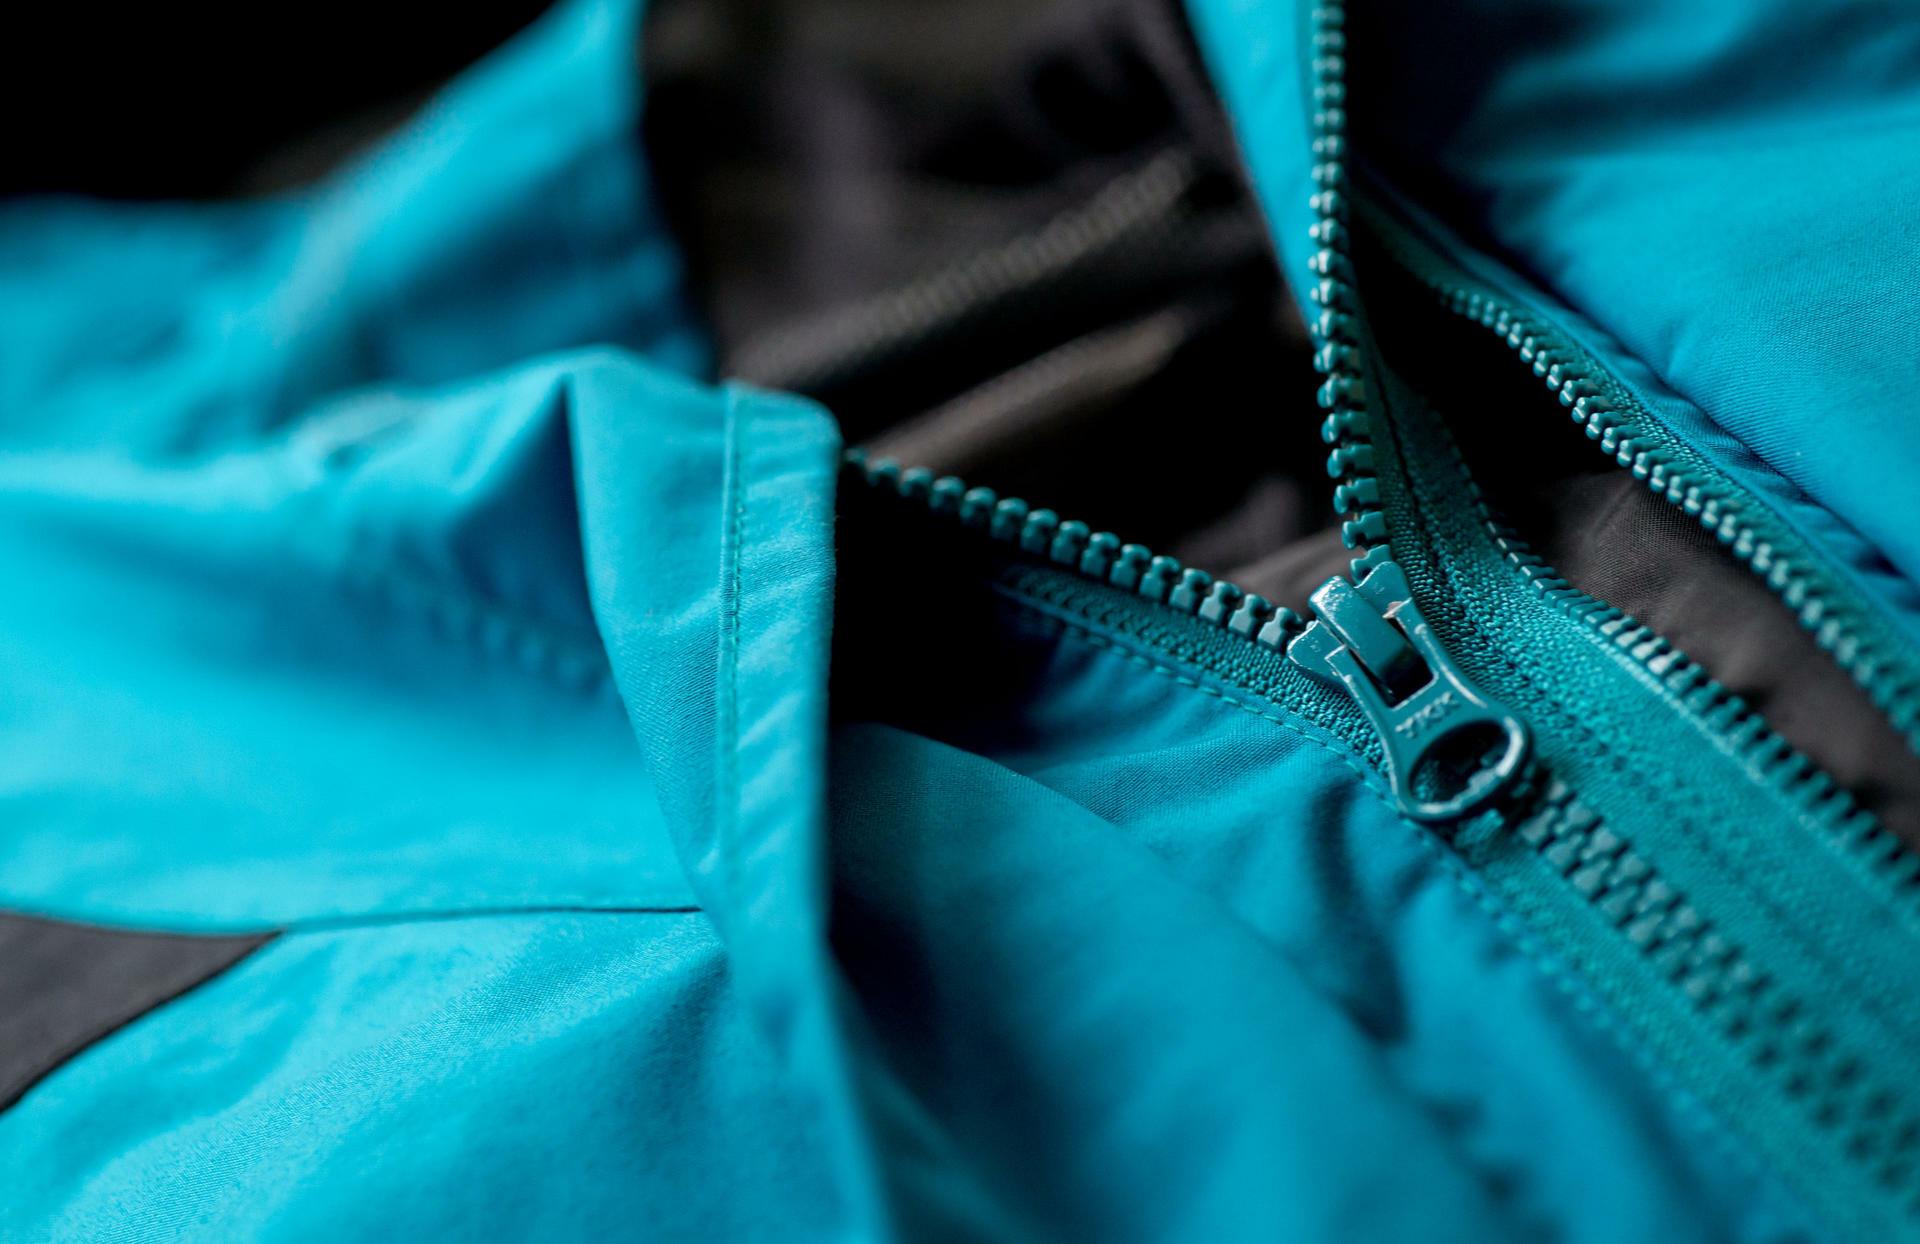 1273c29a18bb60 Greenpeace-Studie  Outdoor-Jacken dünsten Chemikalien aus